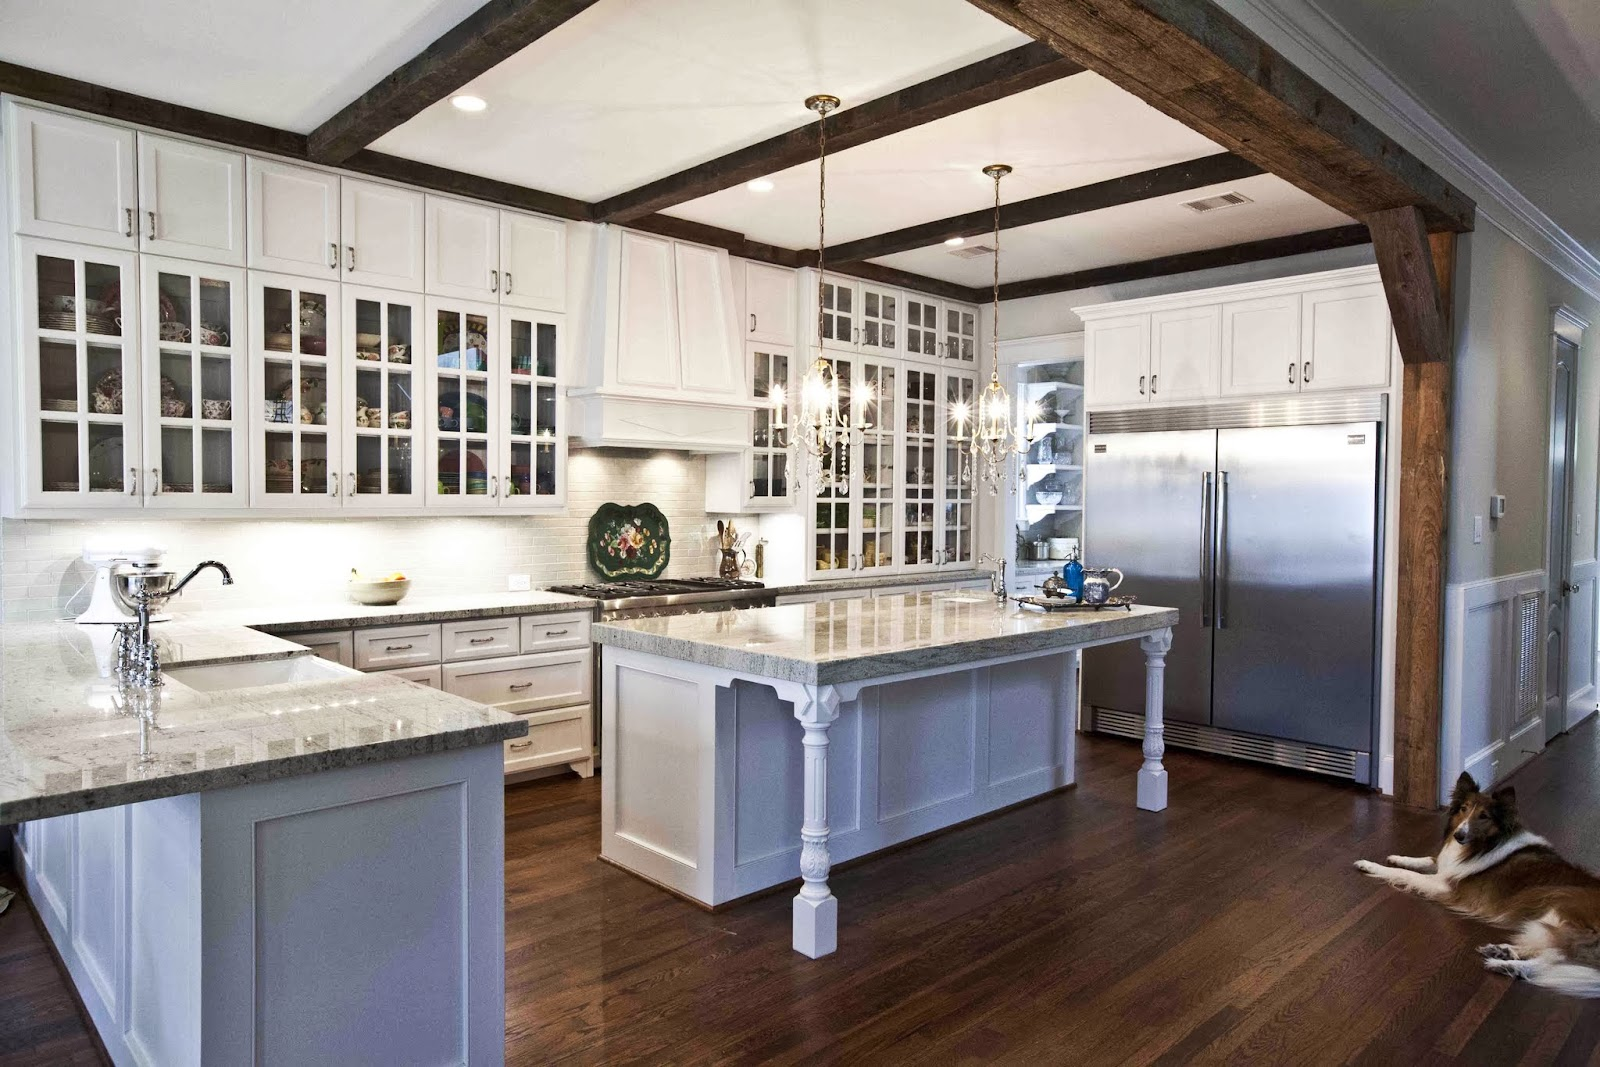 cedar hill ranch kitchen tour and farmhouse kitchen lighting Cedar Hill Ranch Kitchen Tour and Confessions